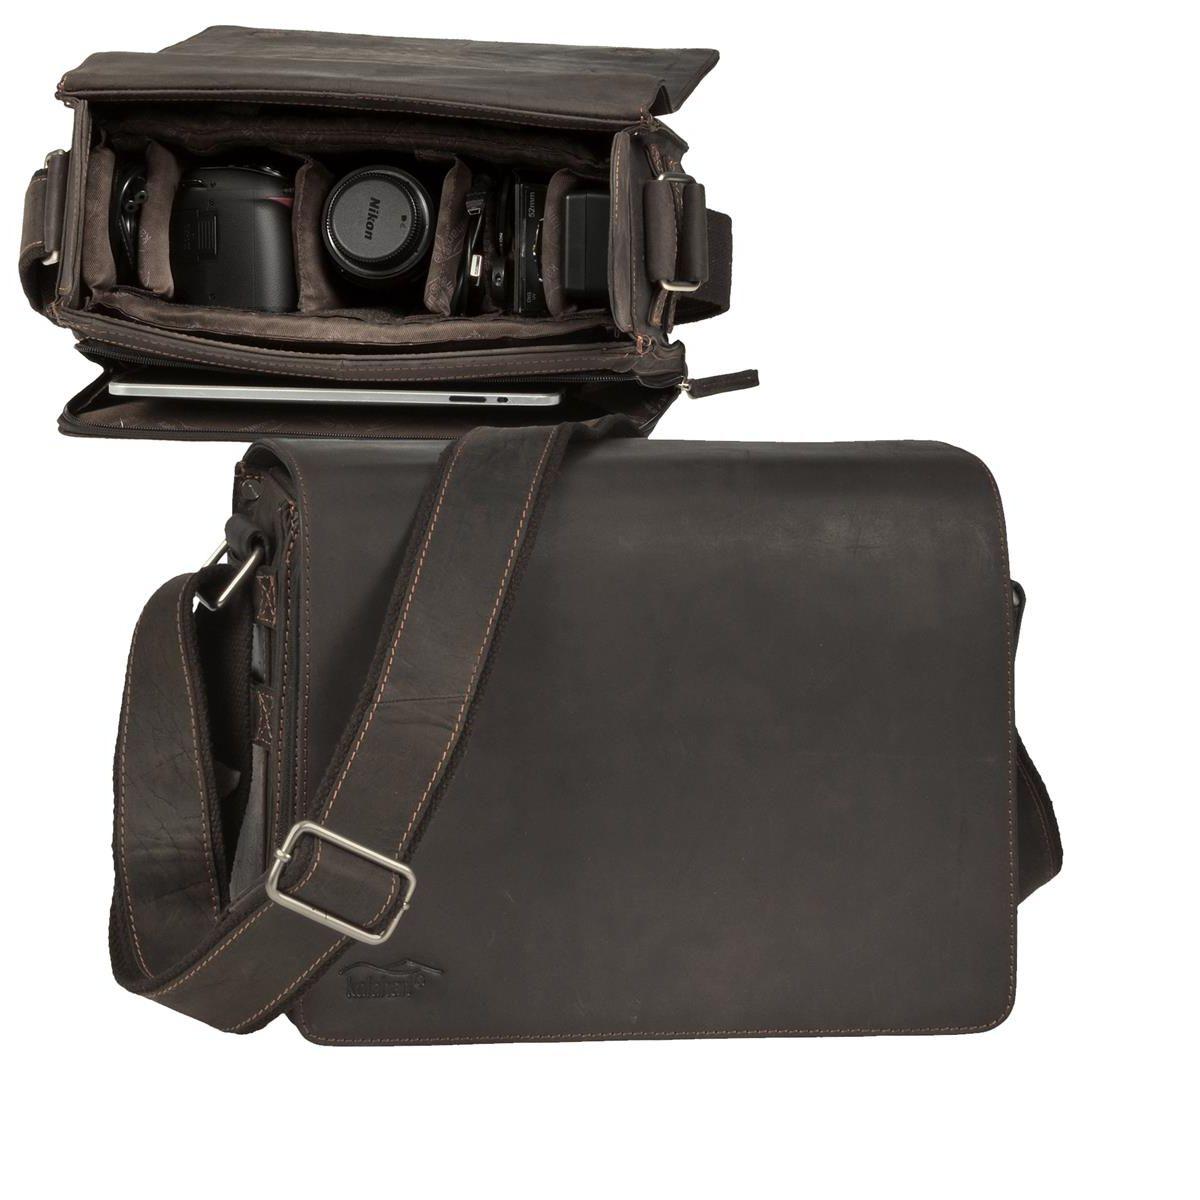 Kalahari Kameratasche Videotasche Fototasche Innentasche L-25 Kaama braun